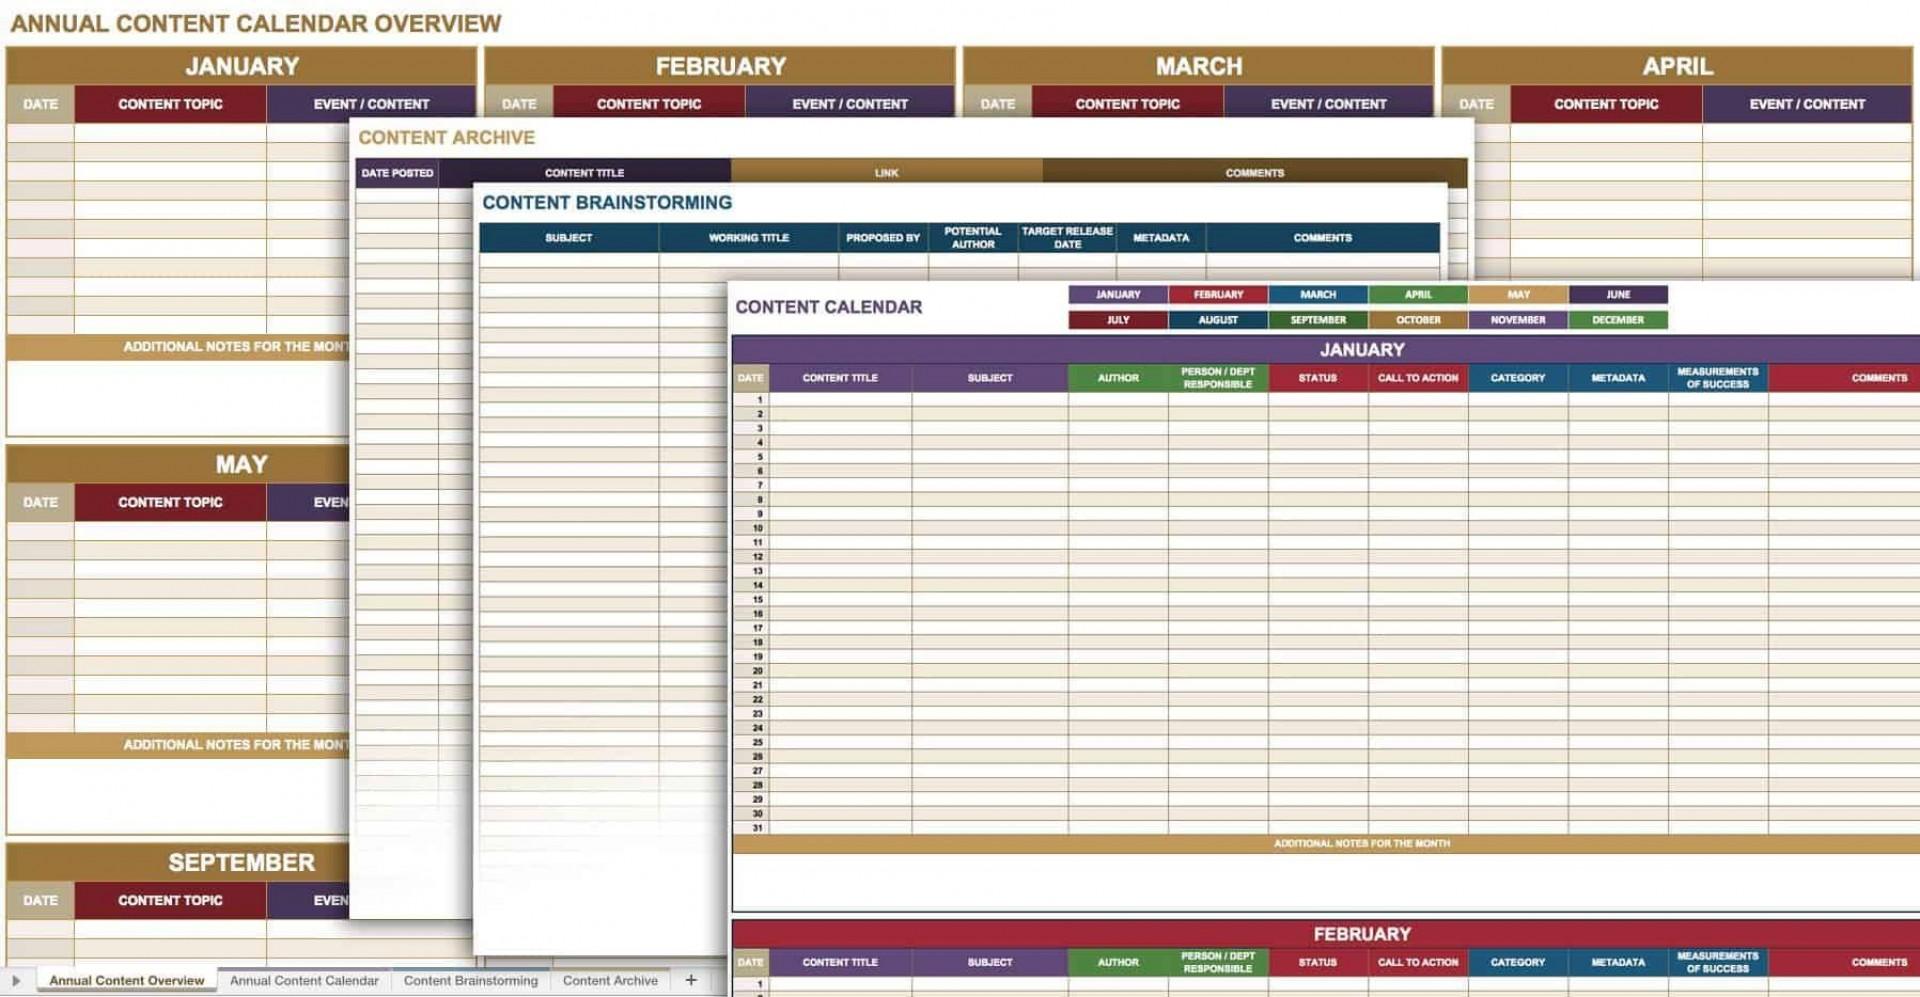 Social Media Editorial Calendar Template Excel from www.addictionary.org